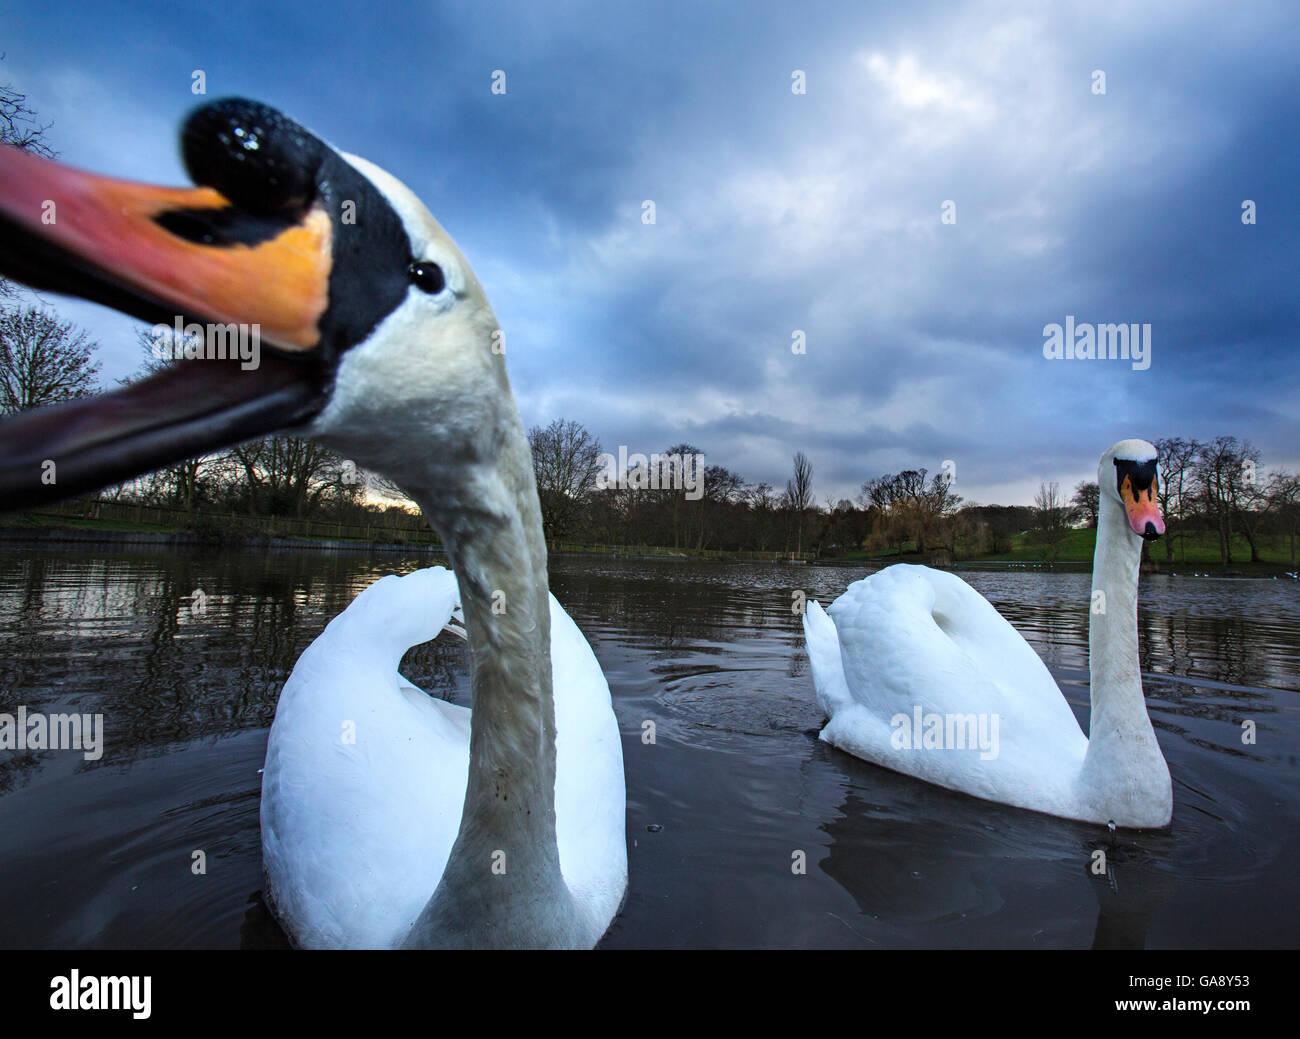 Mute swans (Cygnus olor) Highgate Ponds, Hampstead Heath, London, UK, February. Stock Photo